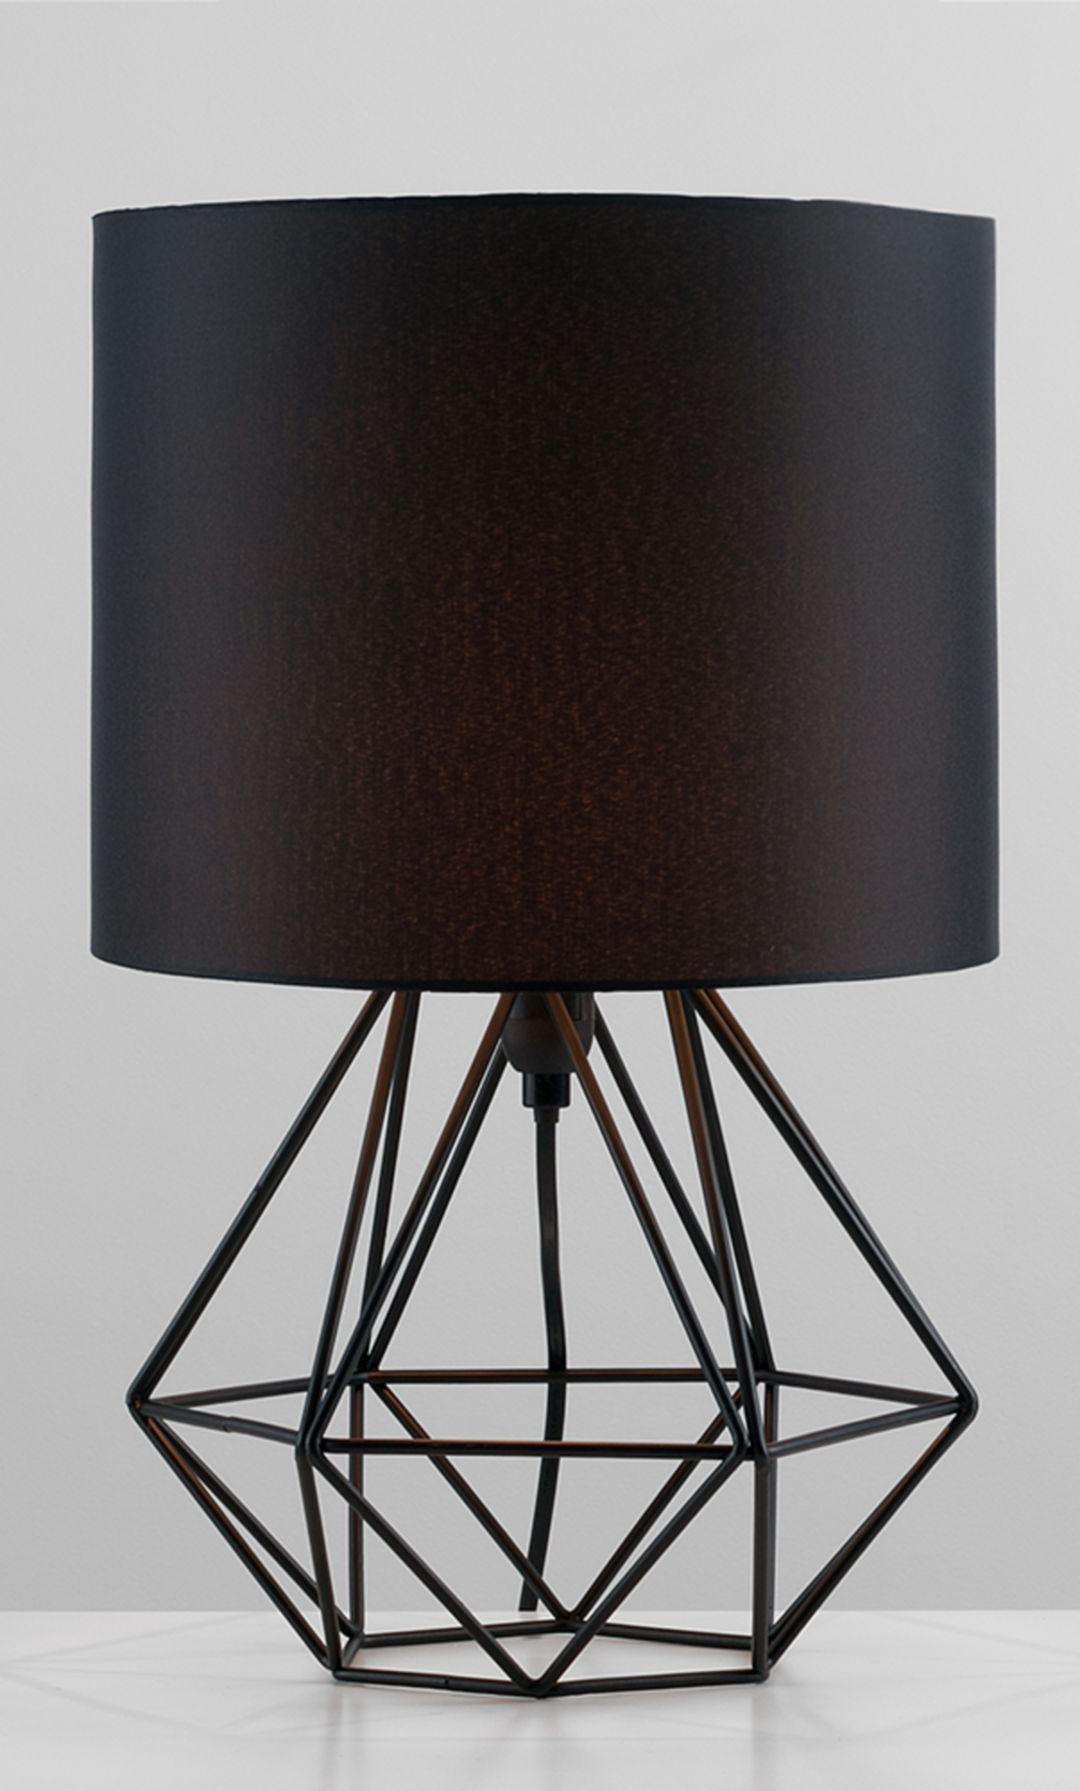 Unique Bedroom Lamp Decorations For Elegant Bedrooms Ideas 200